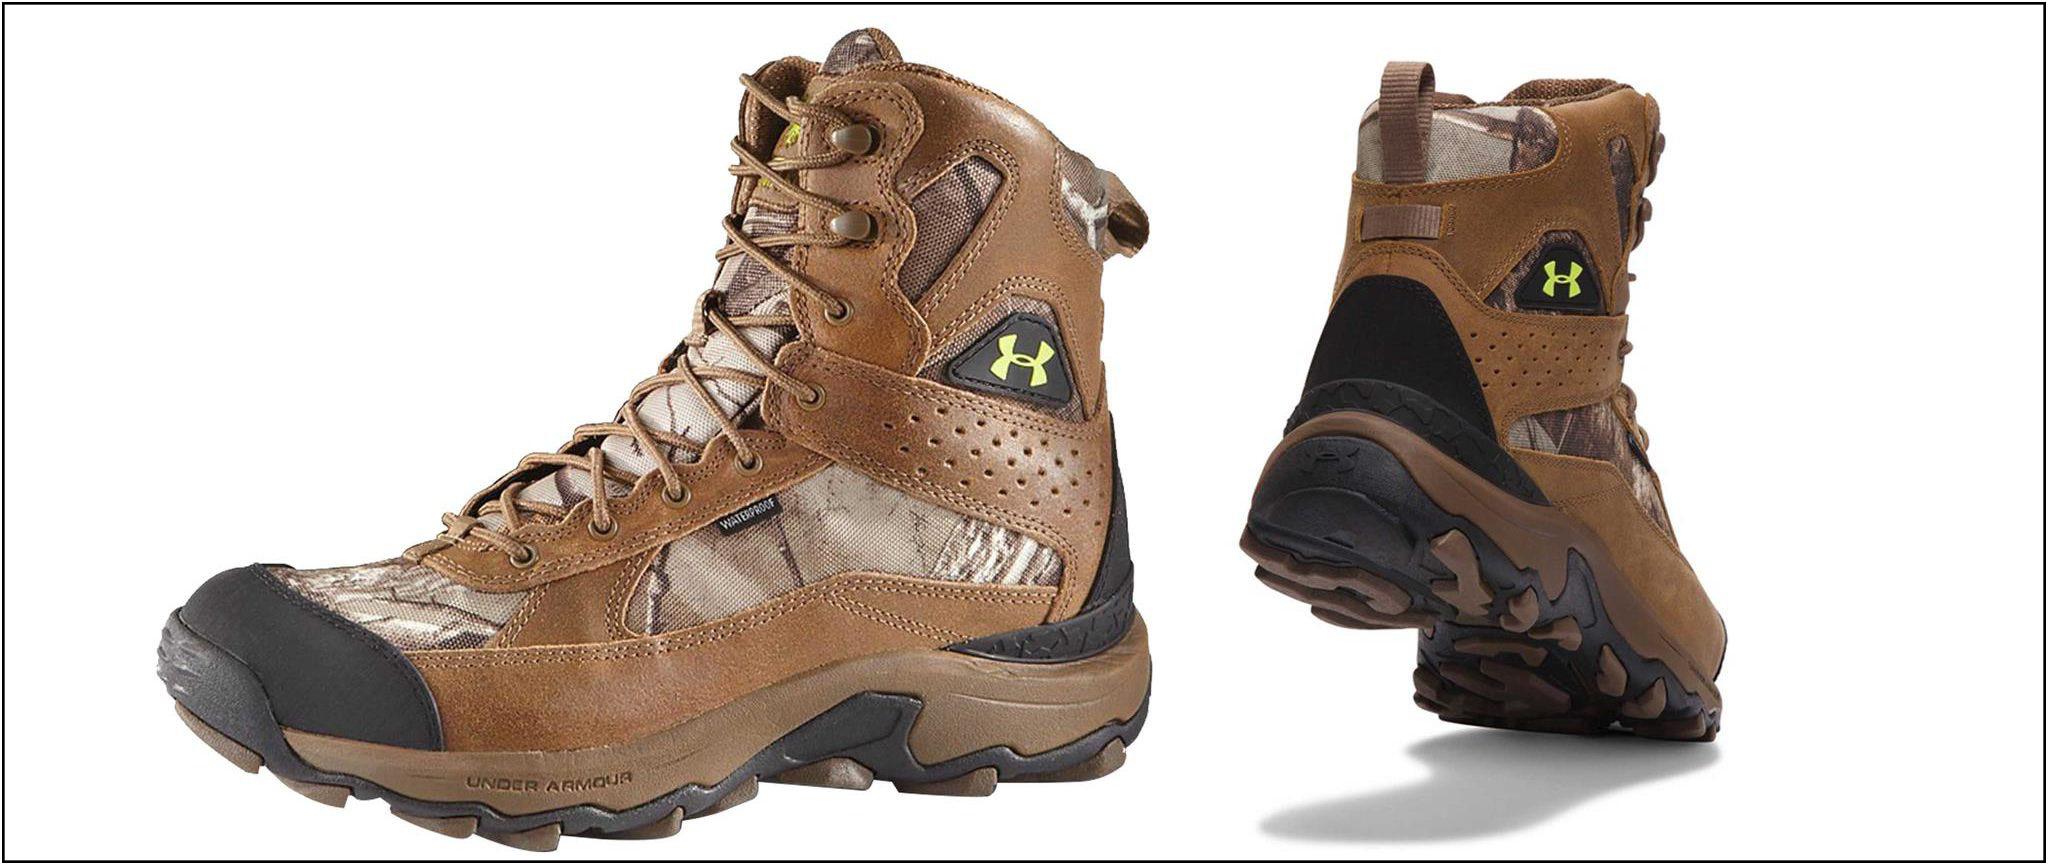 Under-Armour-Mens-Speed-Freek-Bozeman-Hiking-Boot-e1528267431629